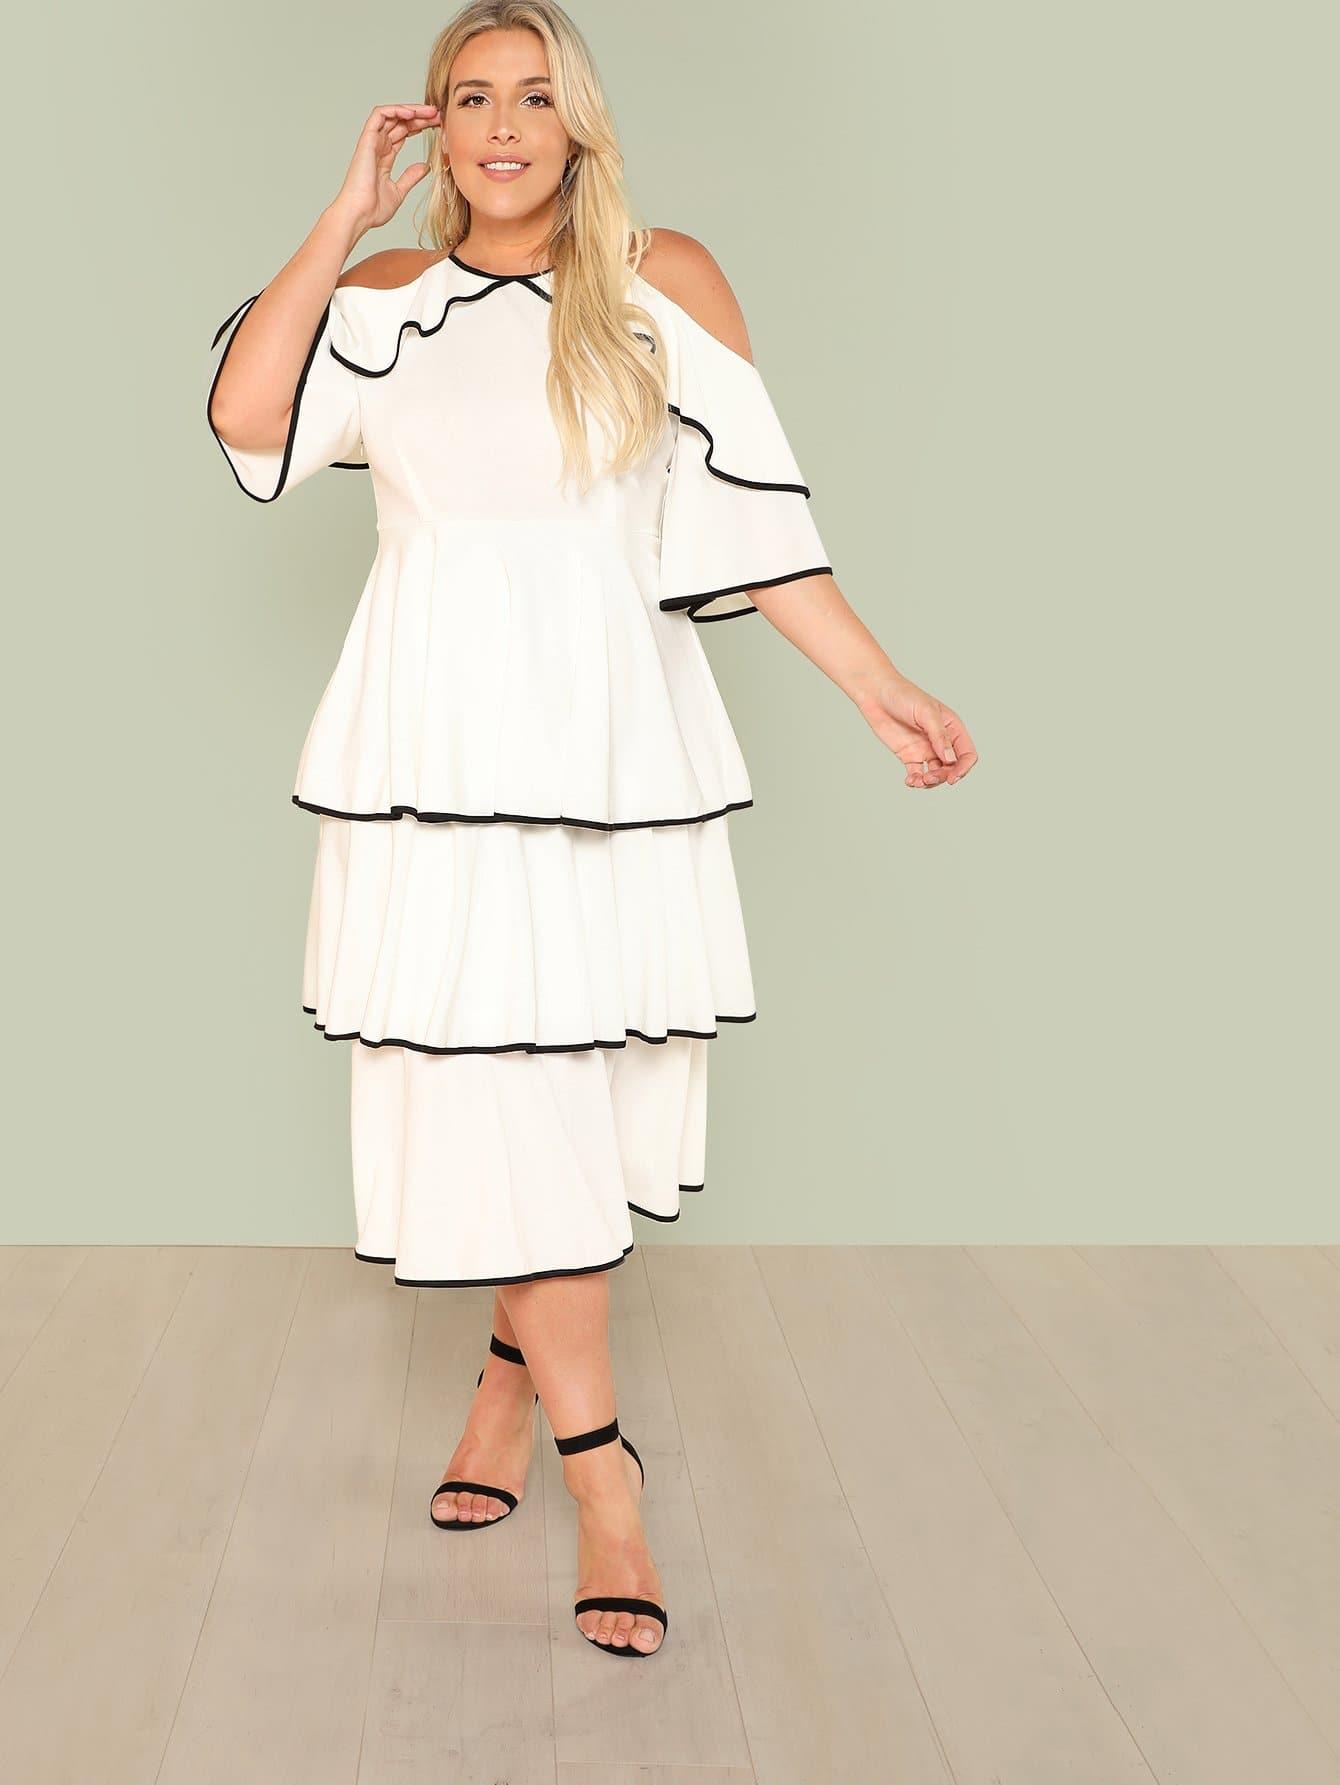 Plus Contrast Binding Cold Shoulder Layered Dress contrast halter and binding layered ruffle bodice jumpsuit